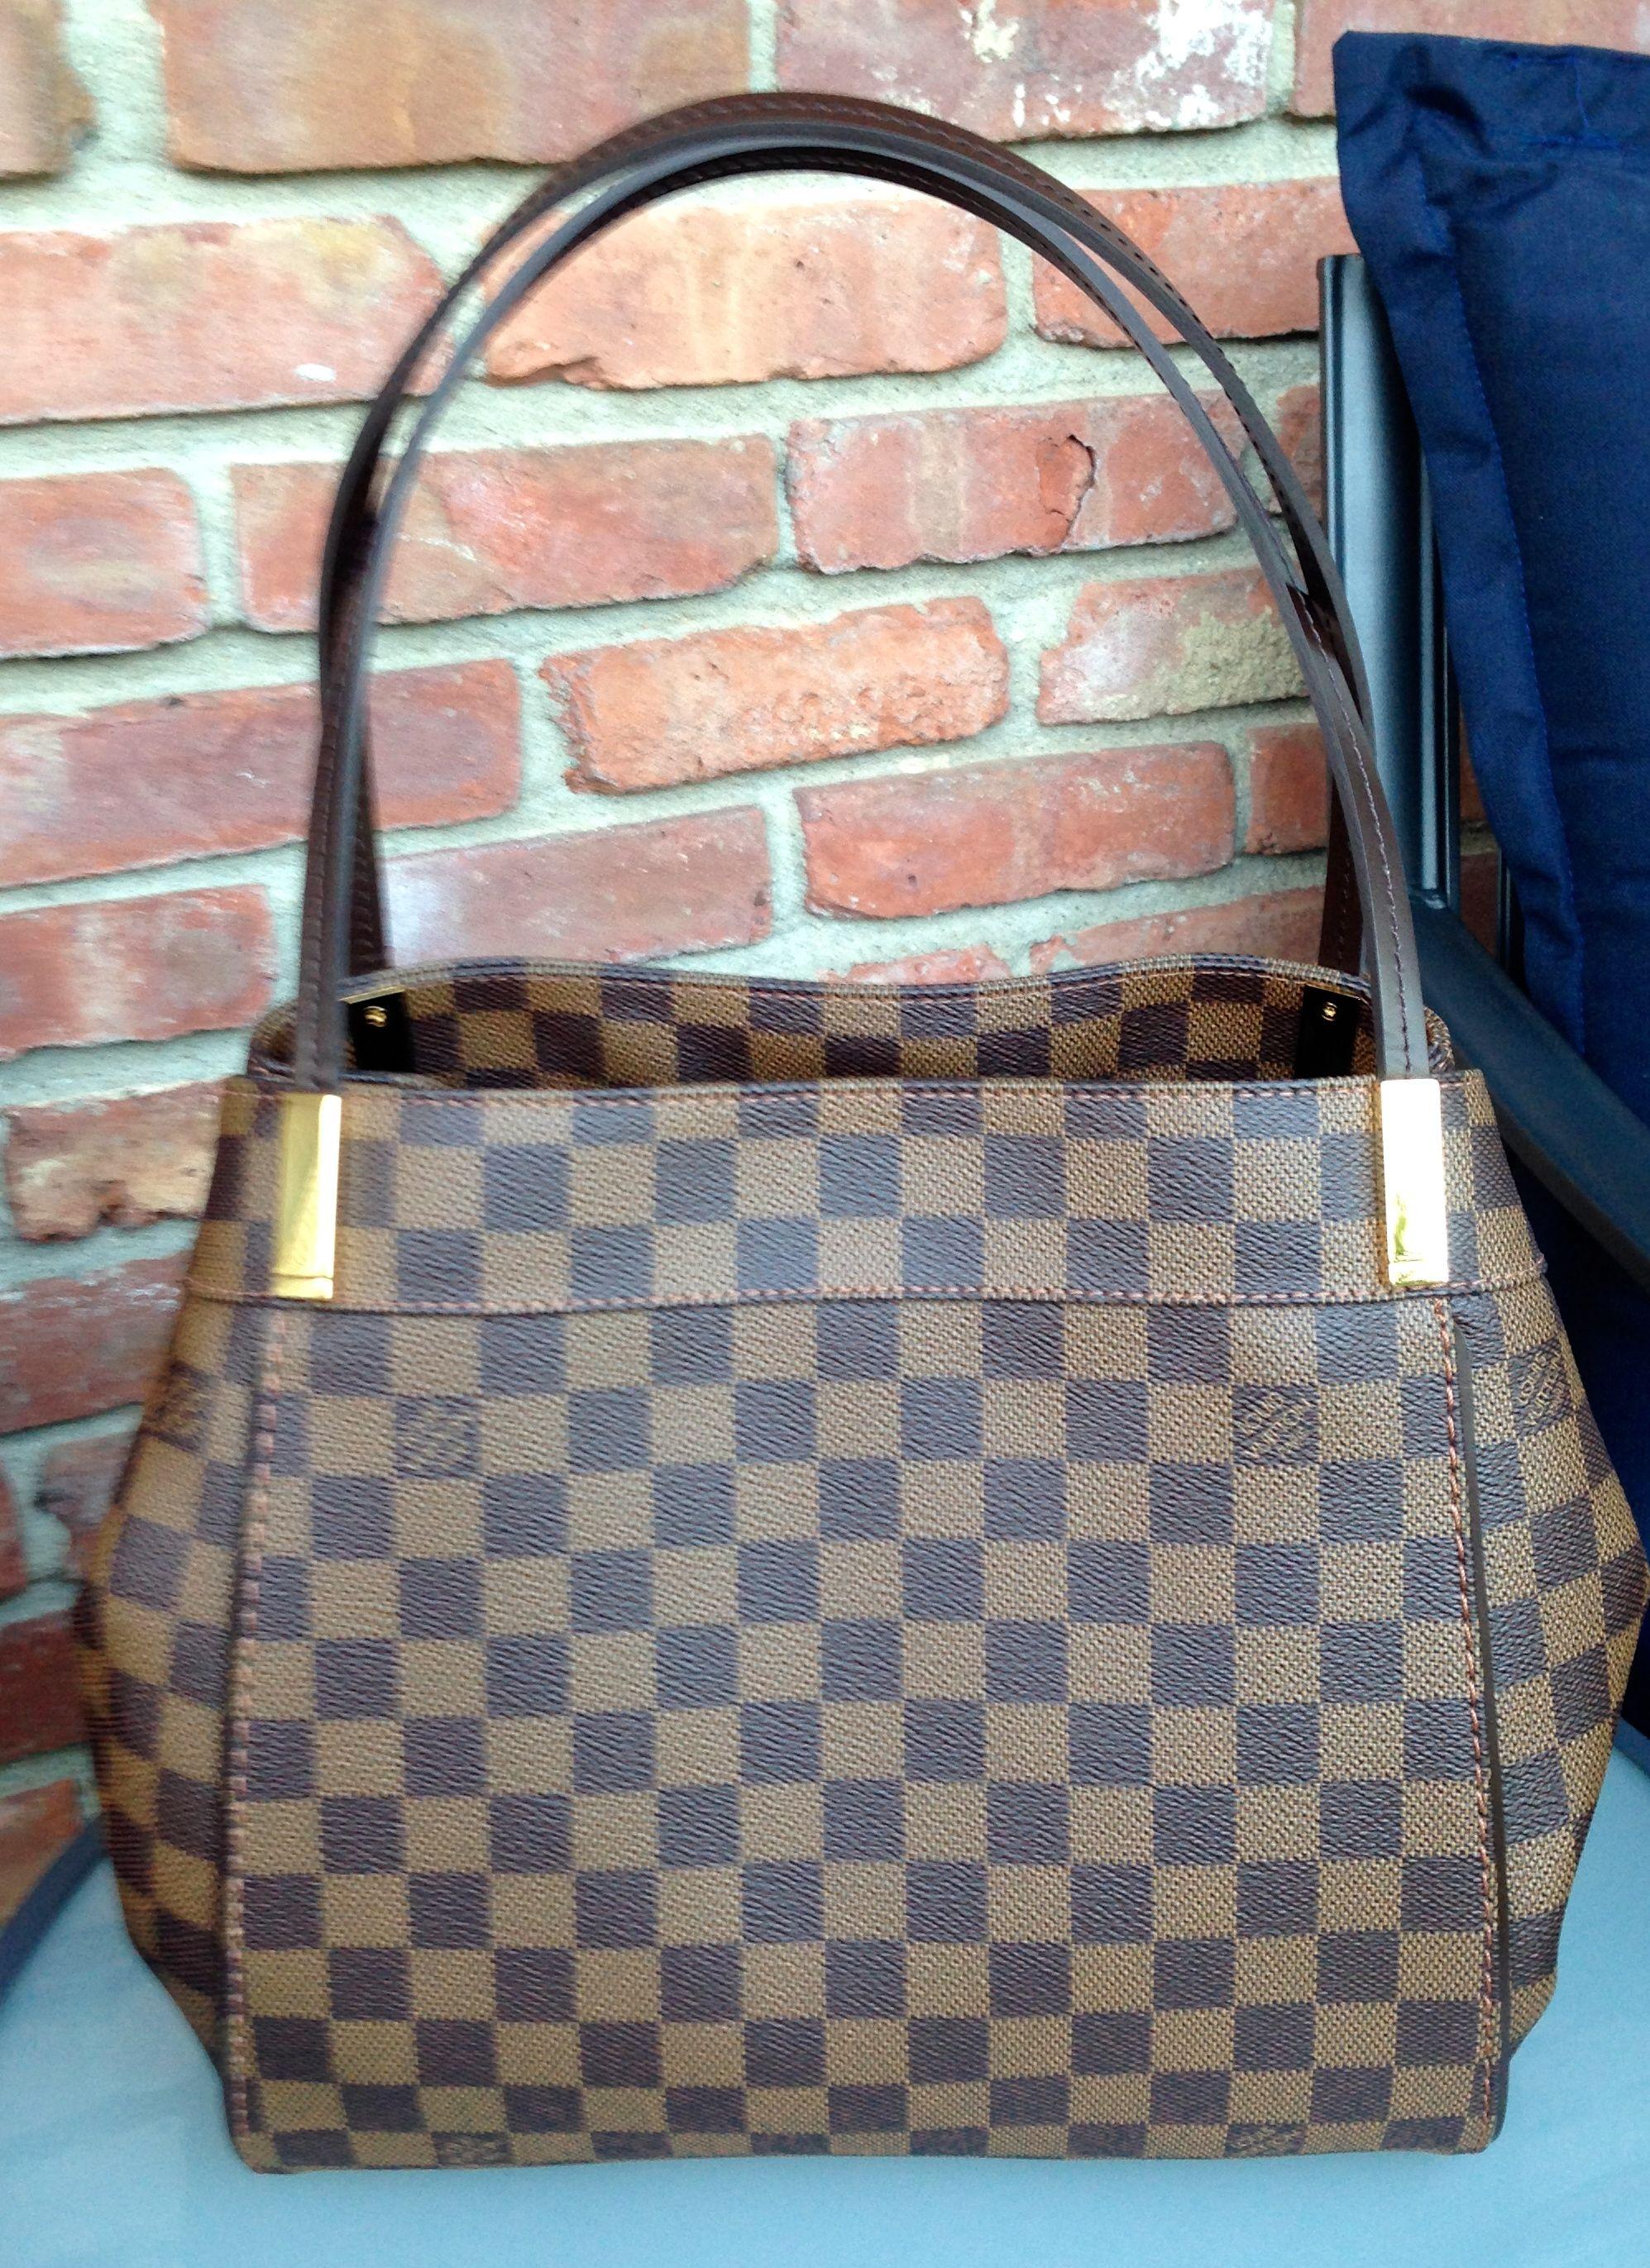 6cc082661bb8 Louis Vuitton Marylebone PM